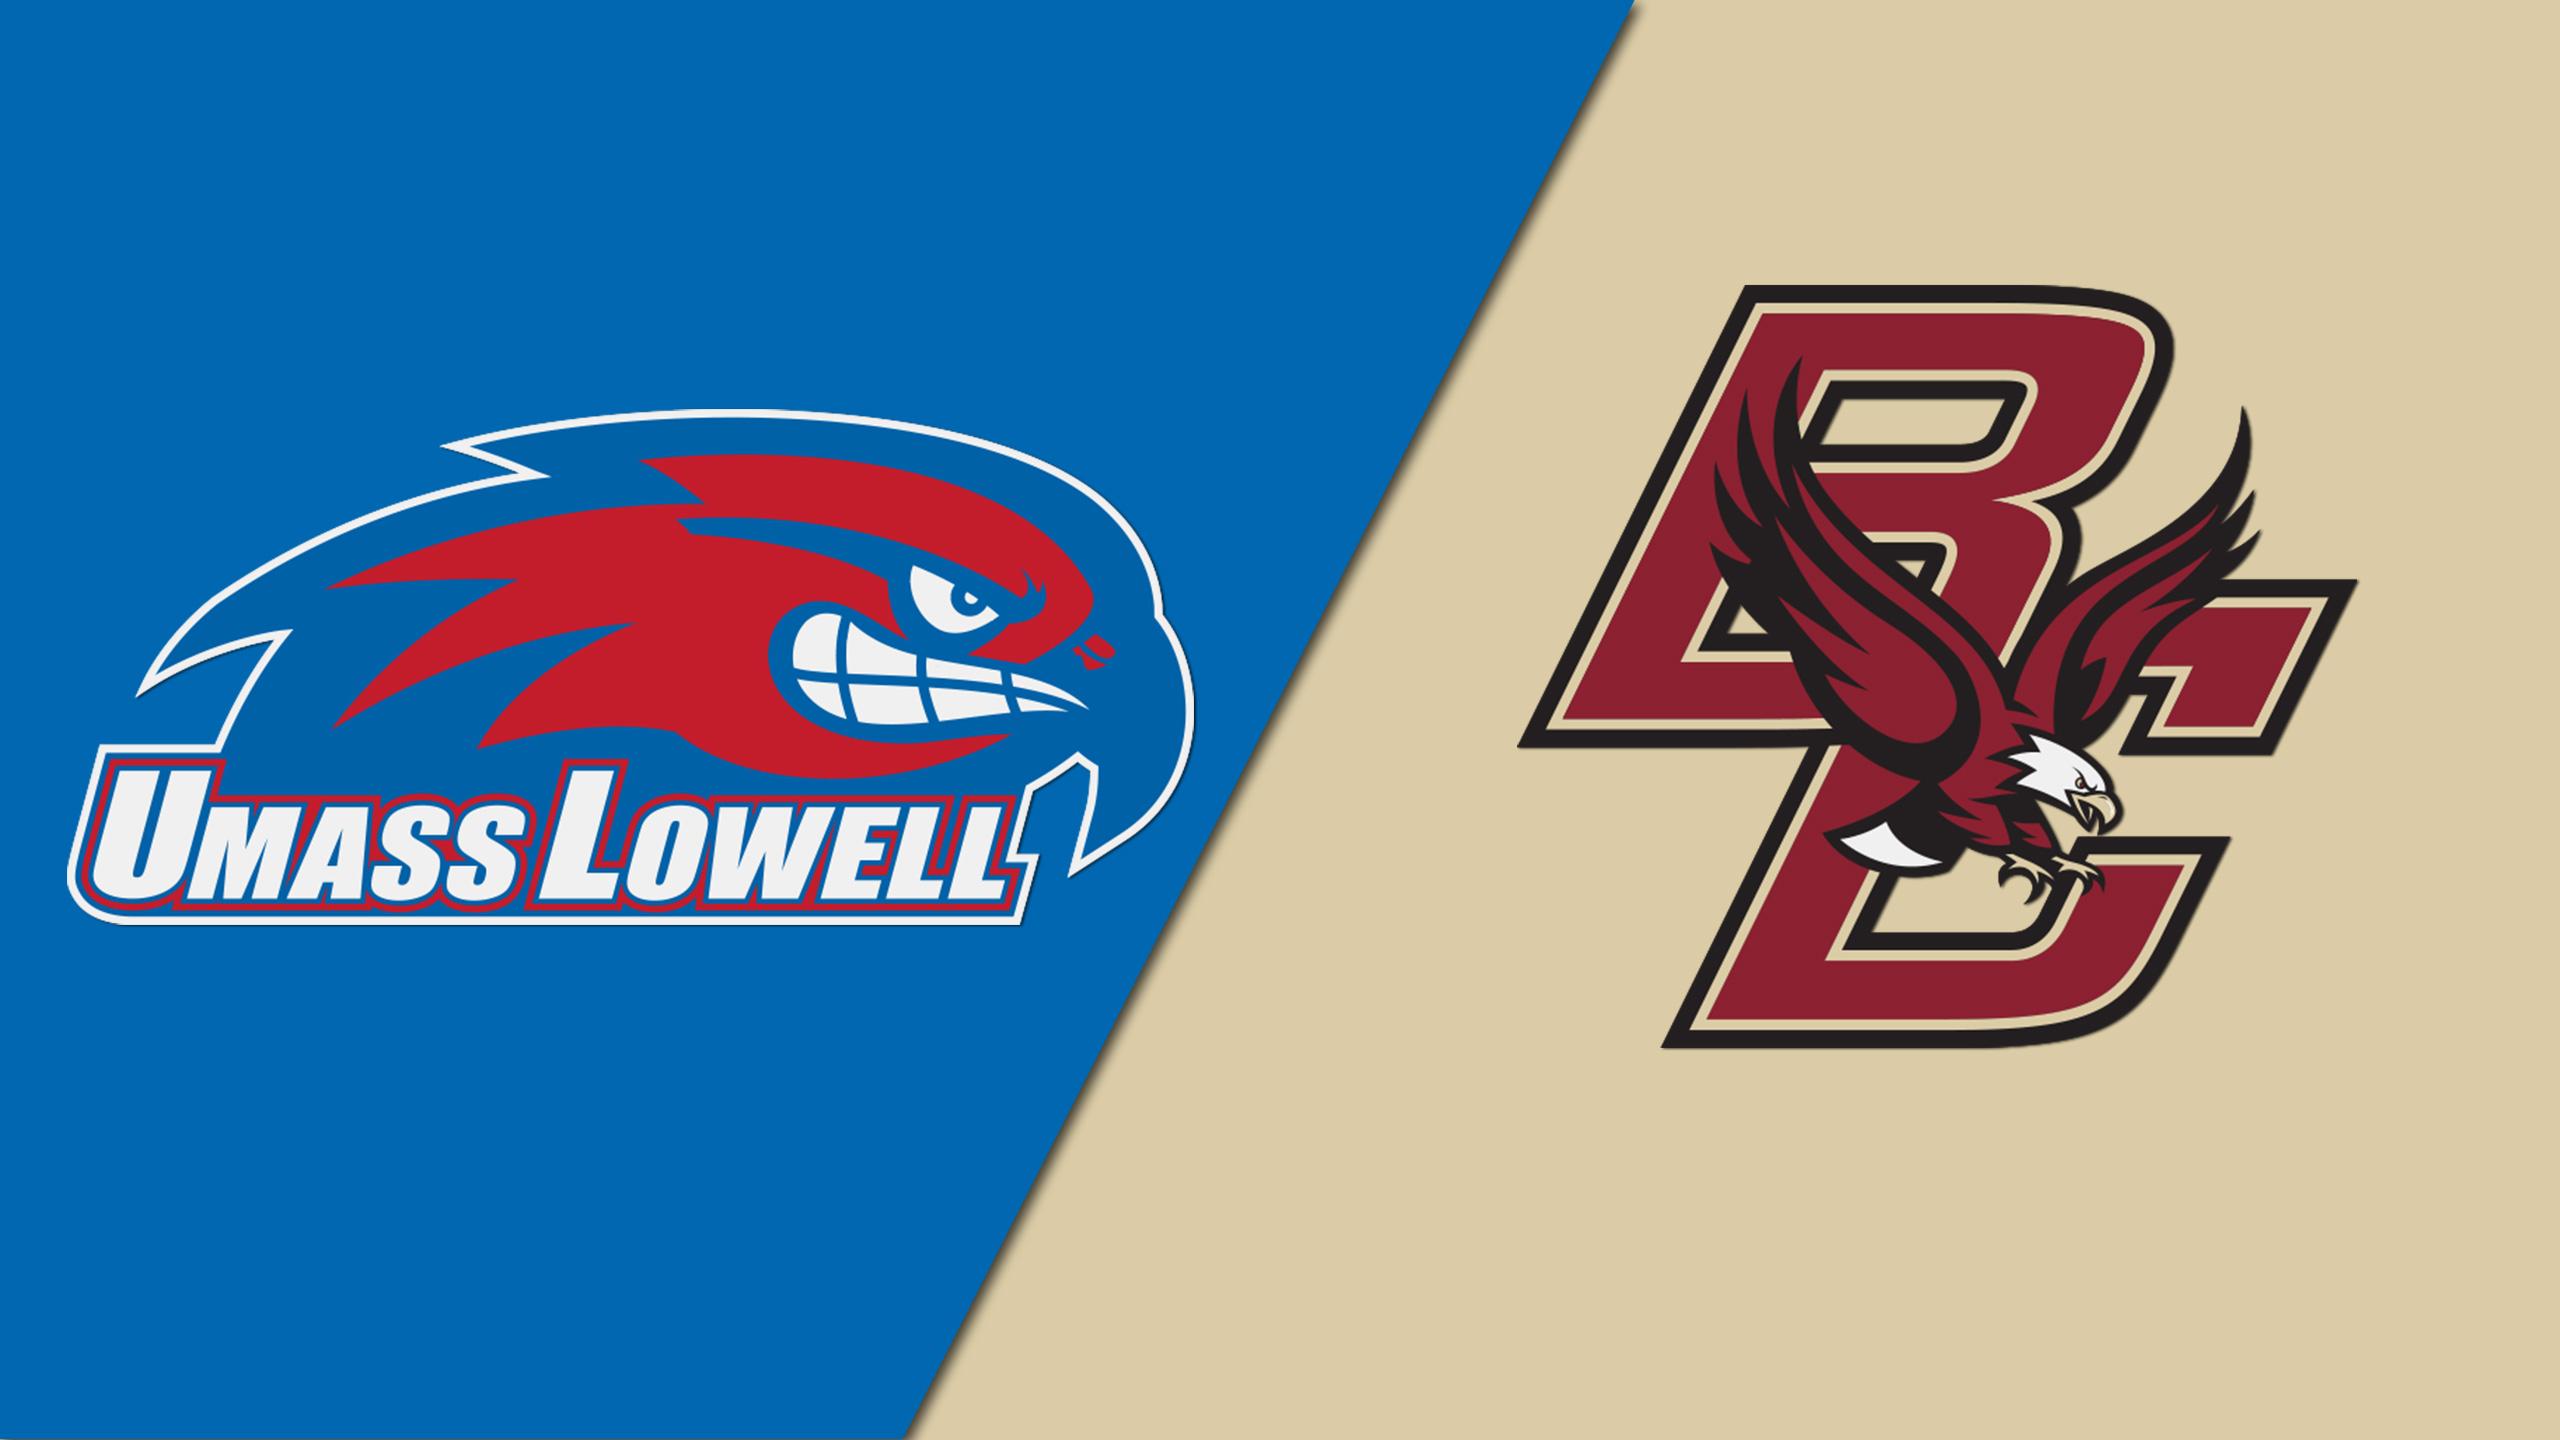 UMass Lowell vs. Boston College (M Hockey)